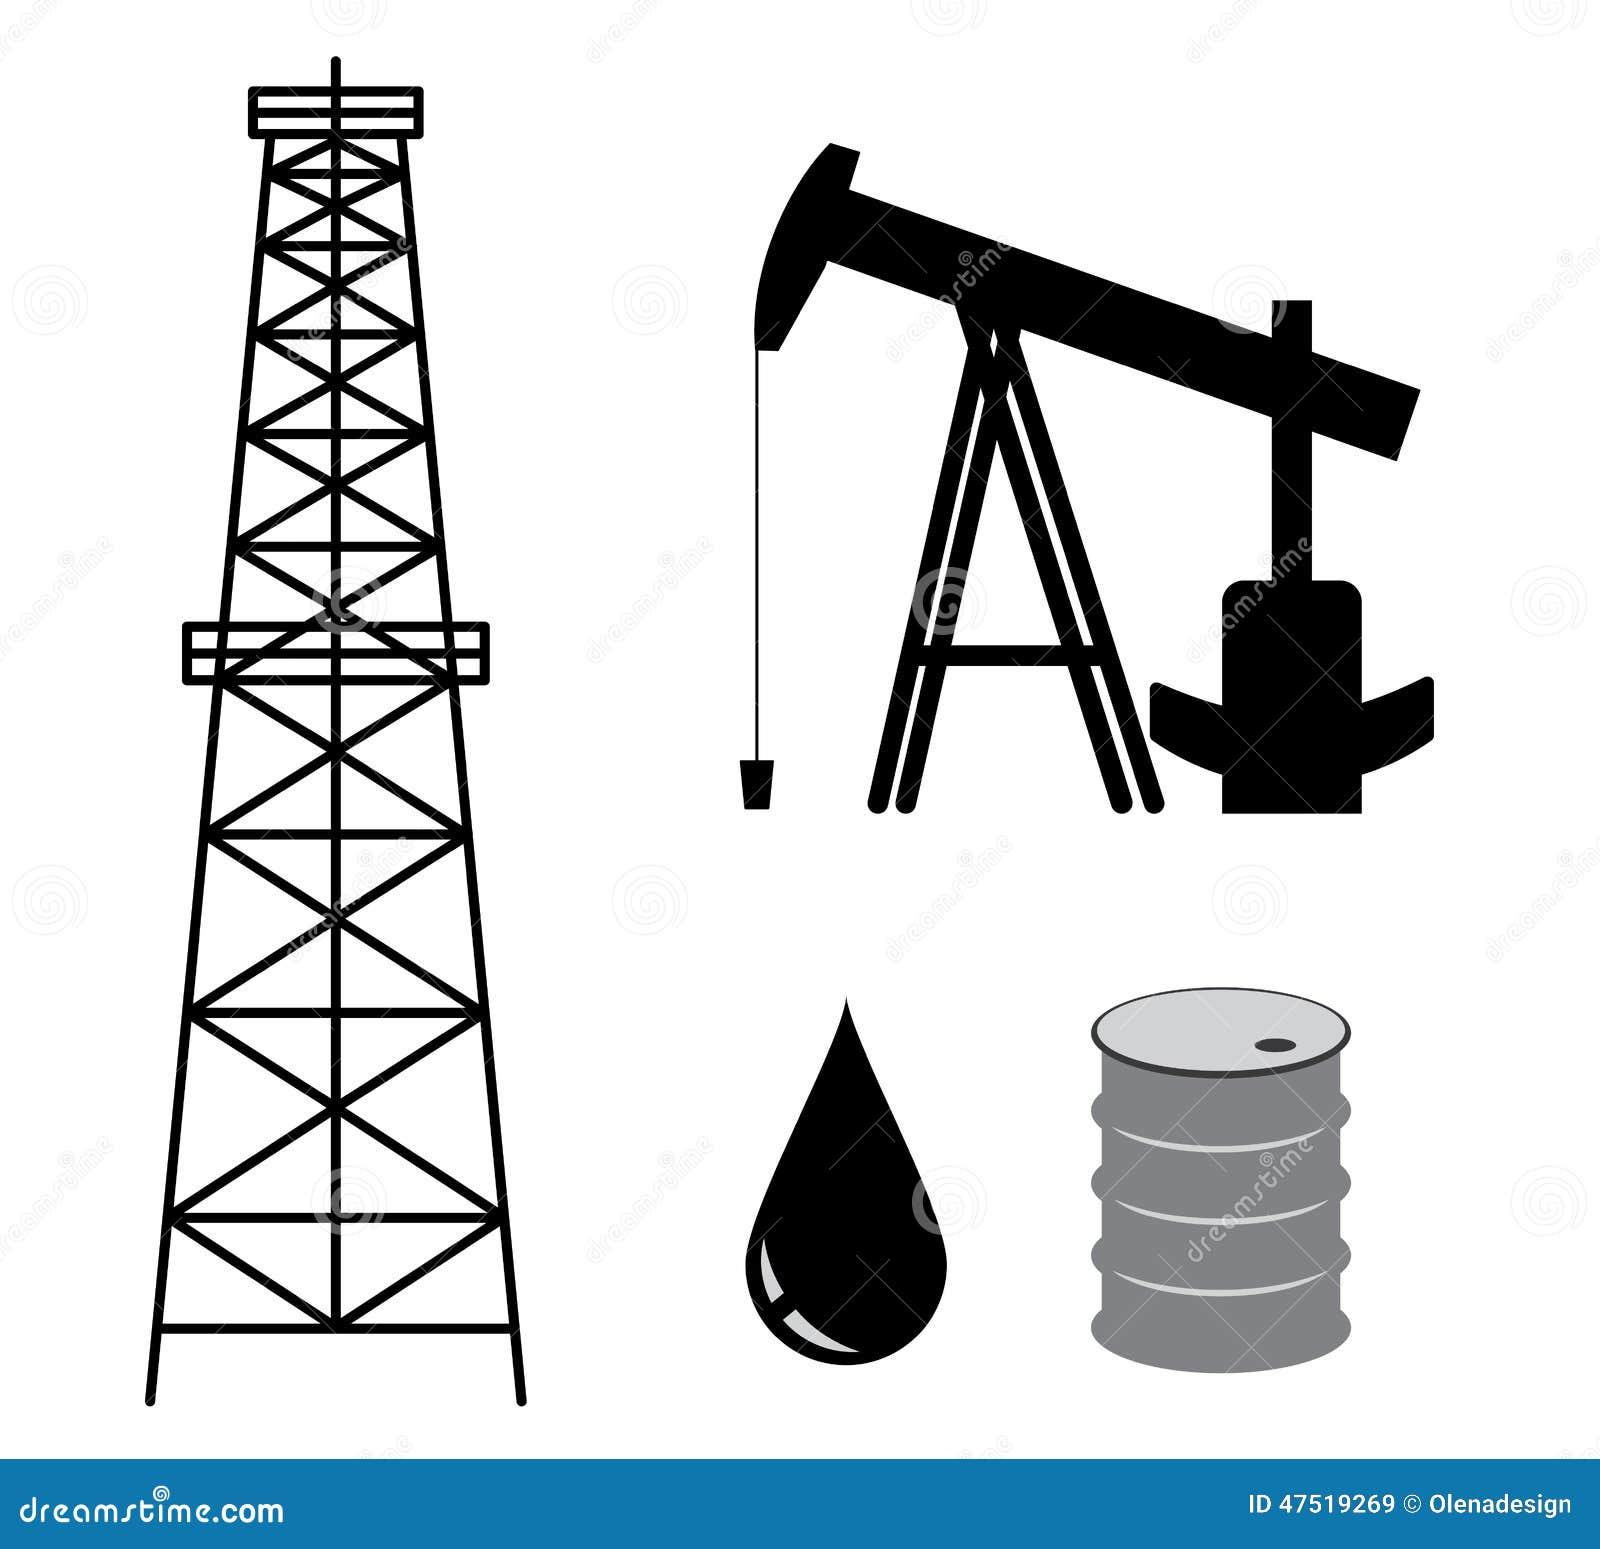 Oil Derrick With Pump And Barrel - Set - Vector Stock Vector - Image ...